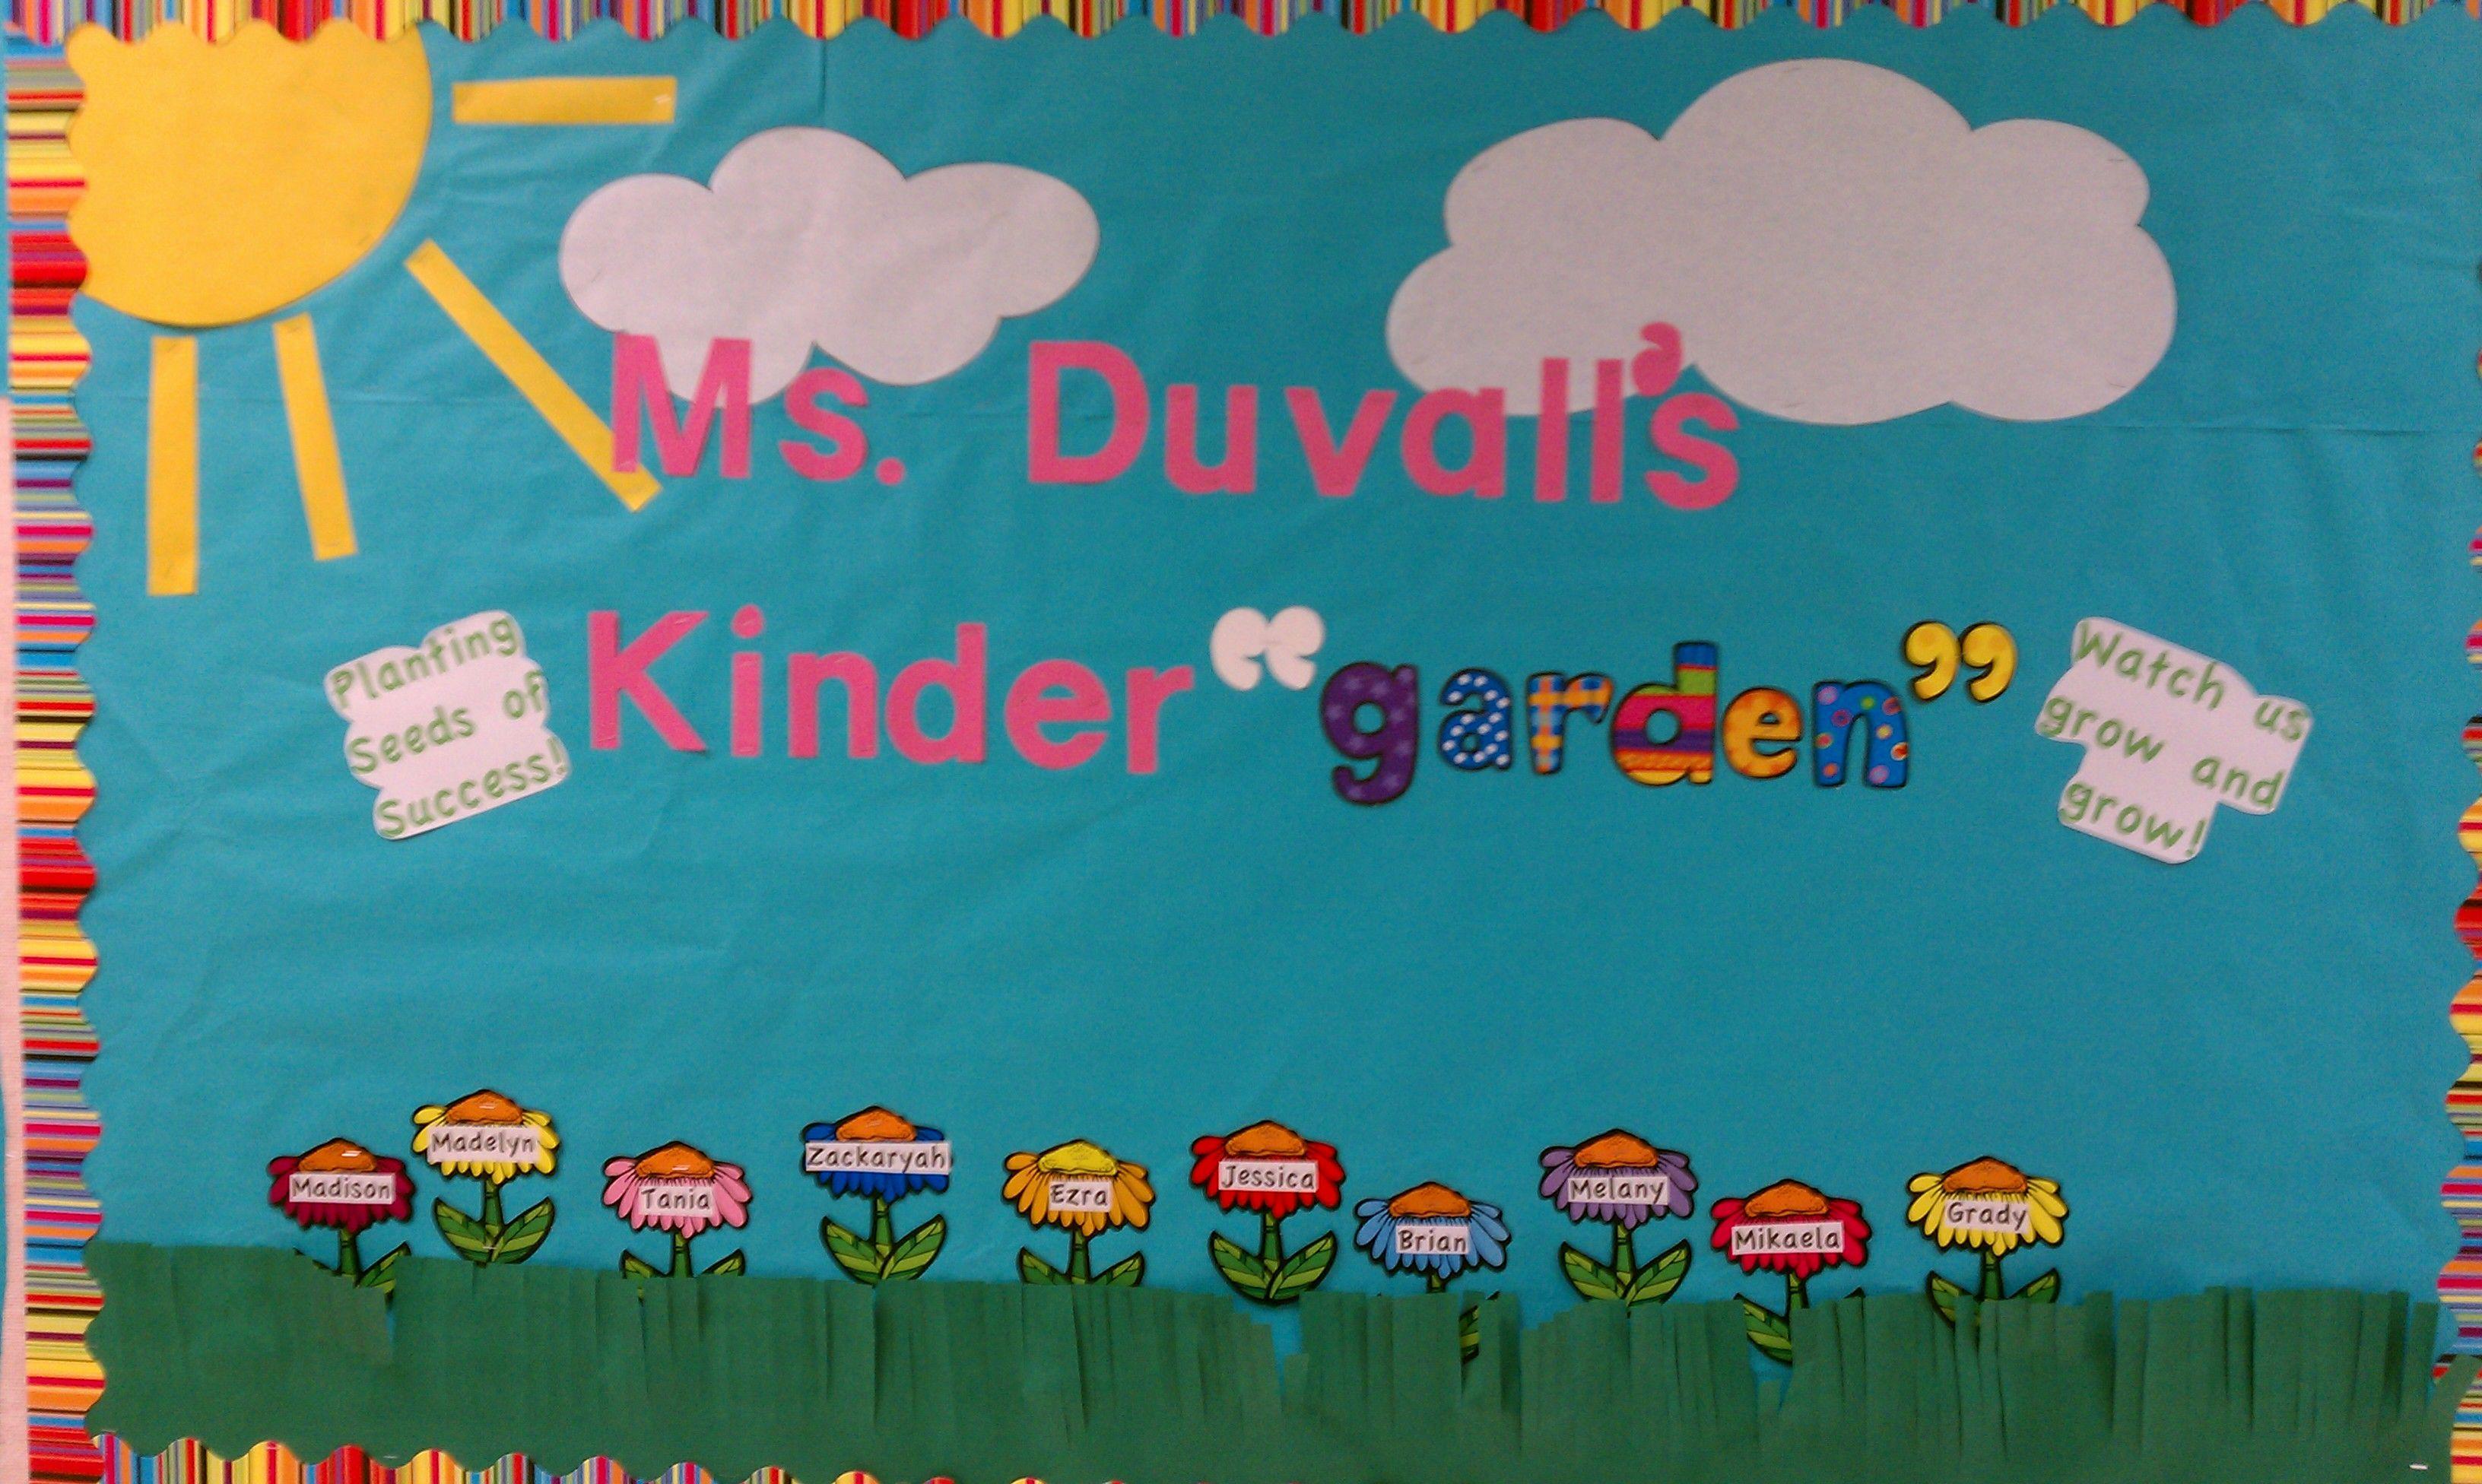 kindergarten kinder garden bulletin board school stuff pinterest garden bulletin boards. Black Bedroom Furniture Sets. Home Design Ideas